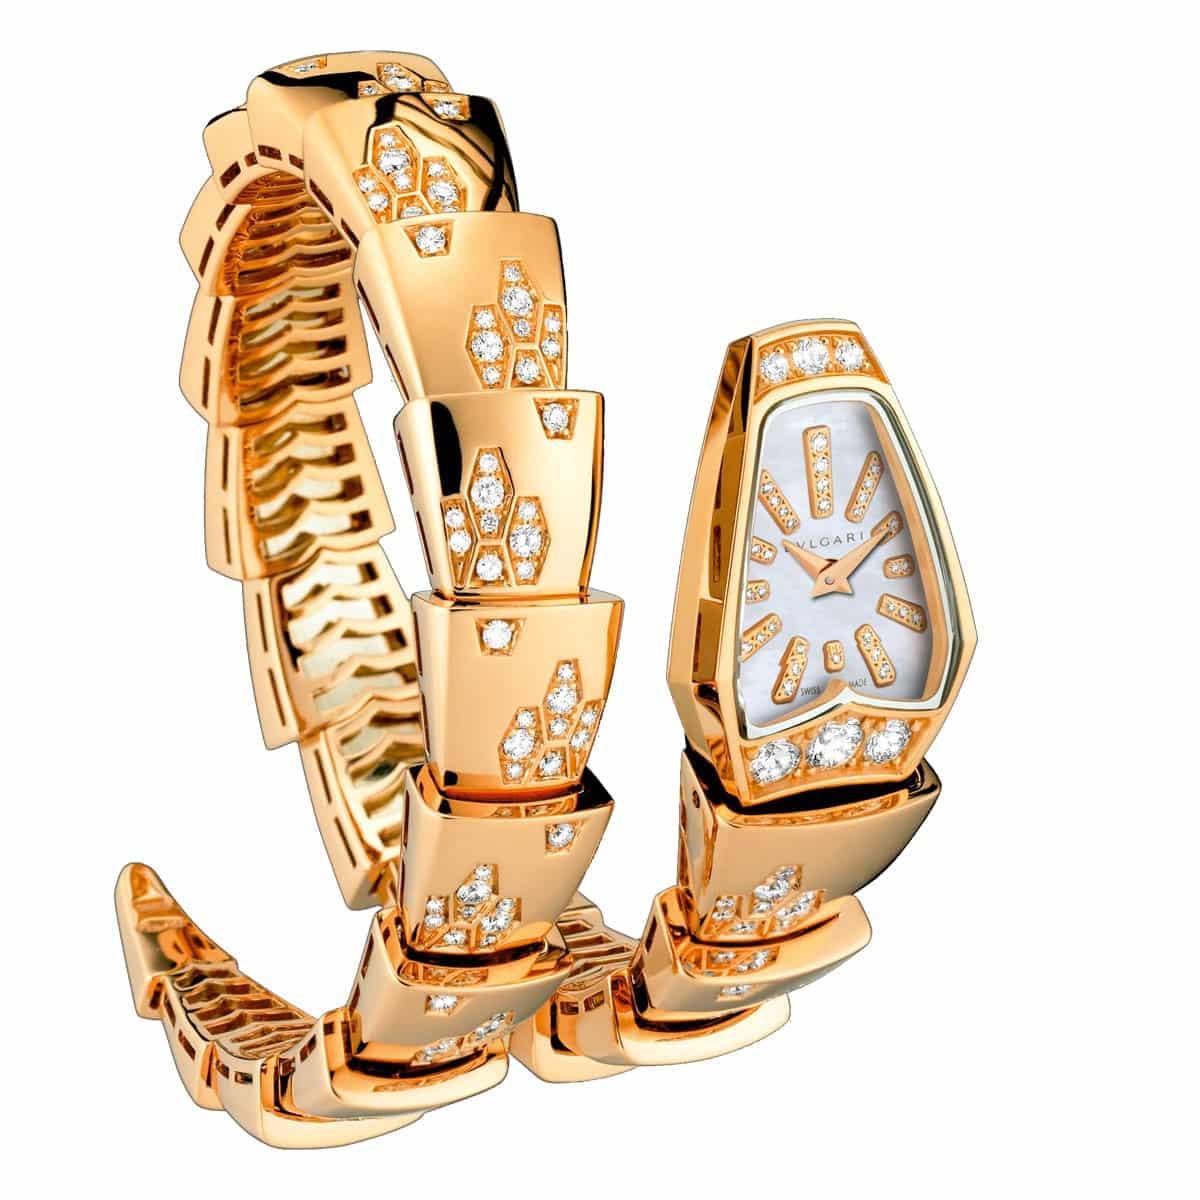 98e3a163cd1 Bulgari Serpenti Jewelery - Lionel Meylan Vevey